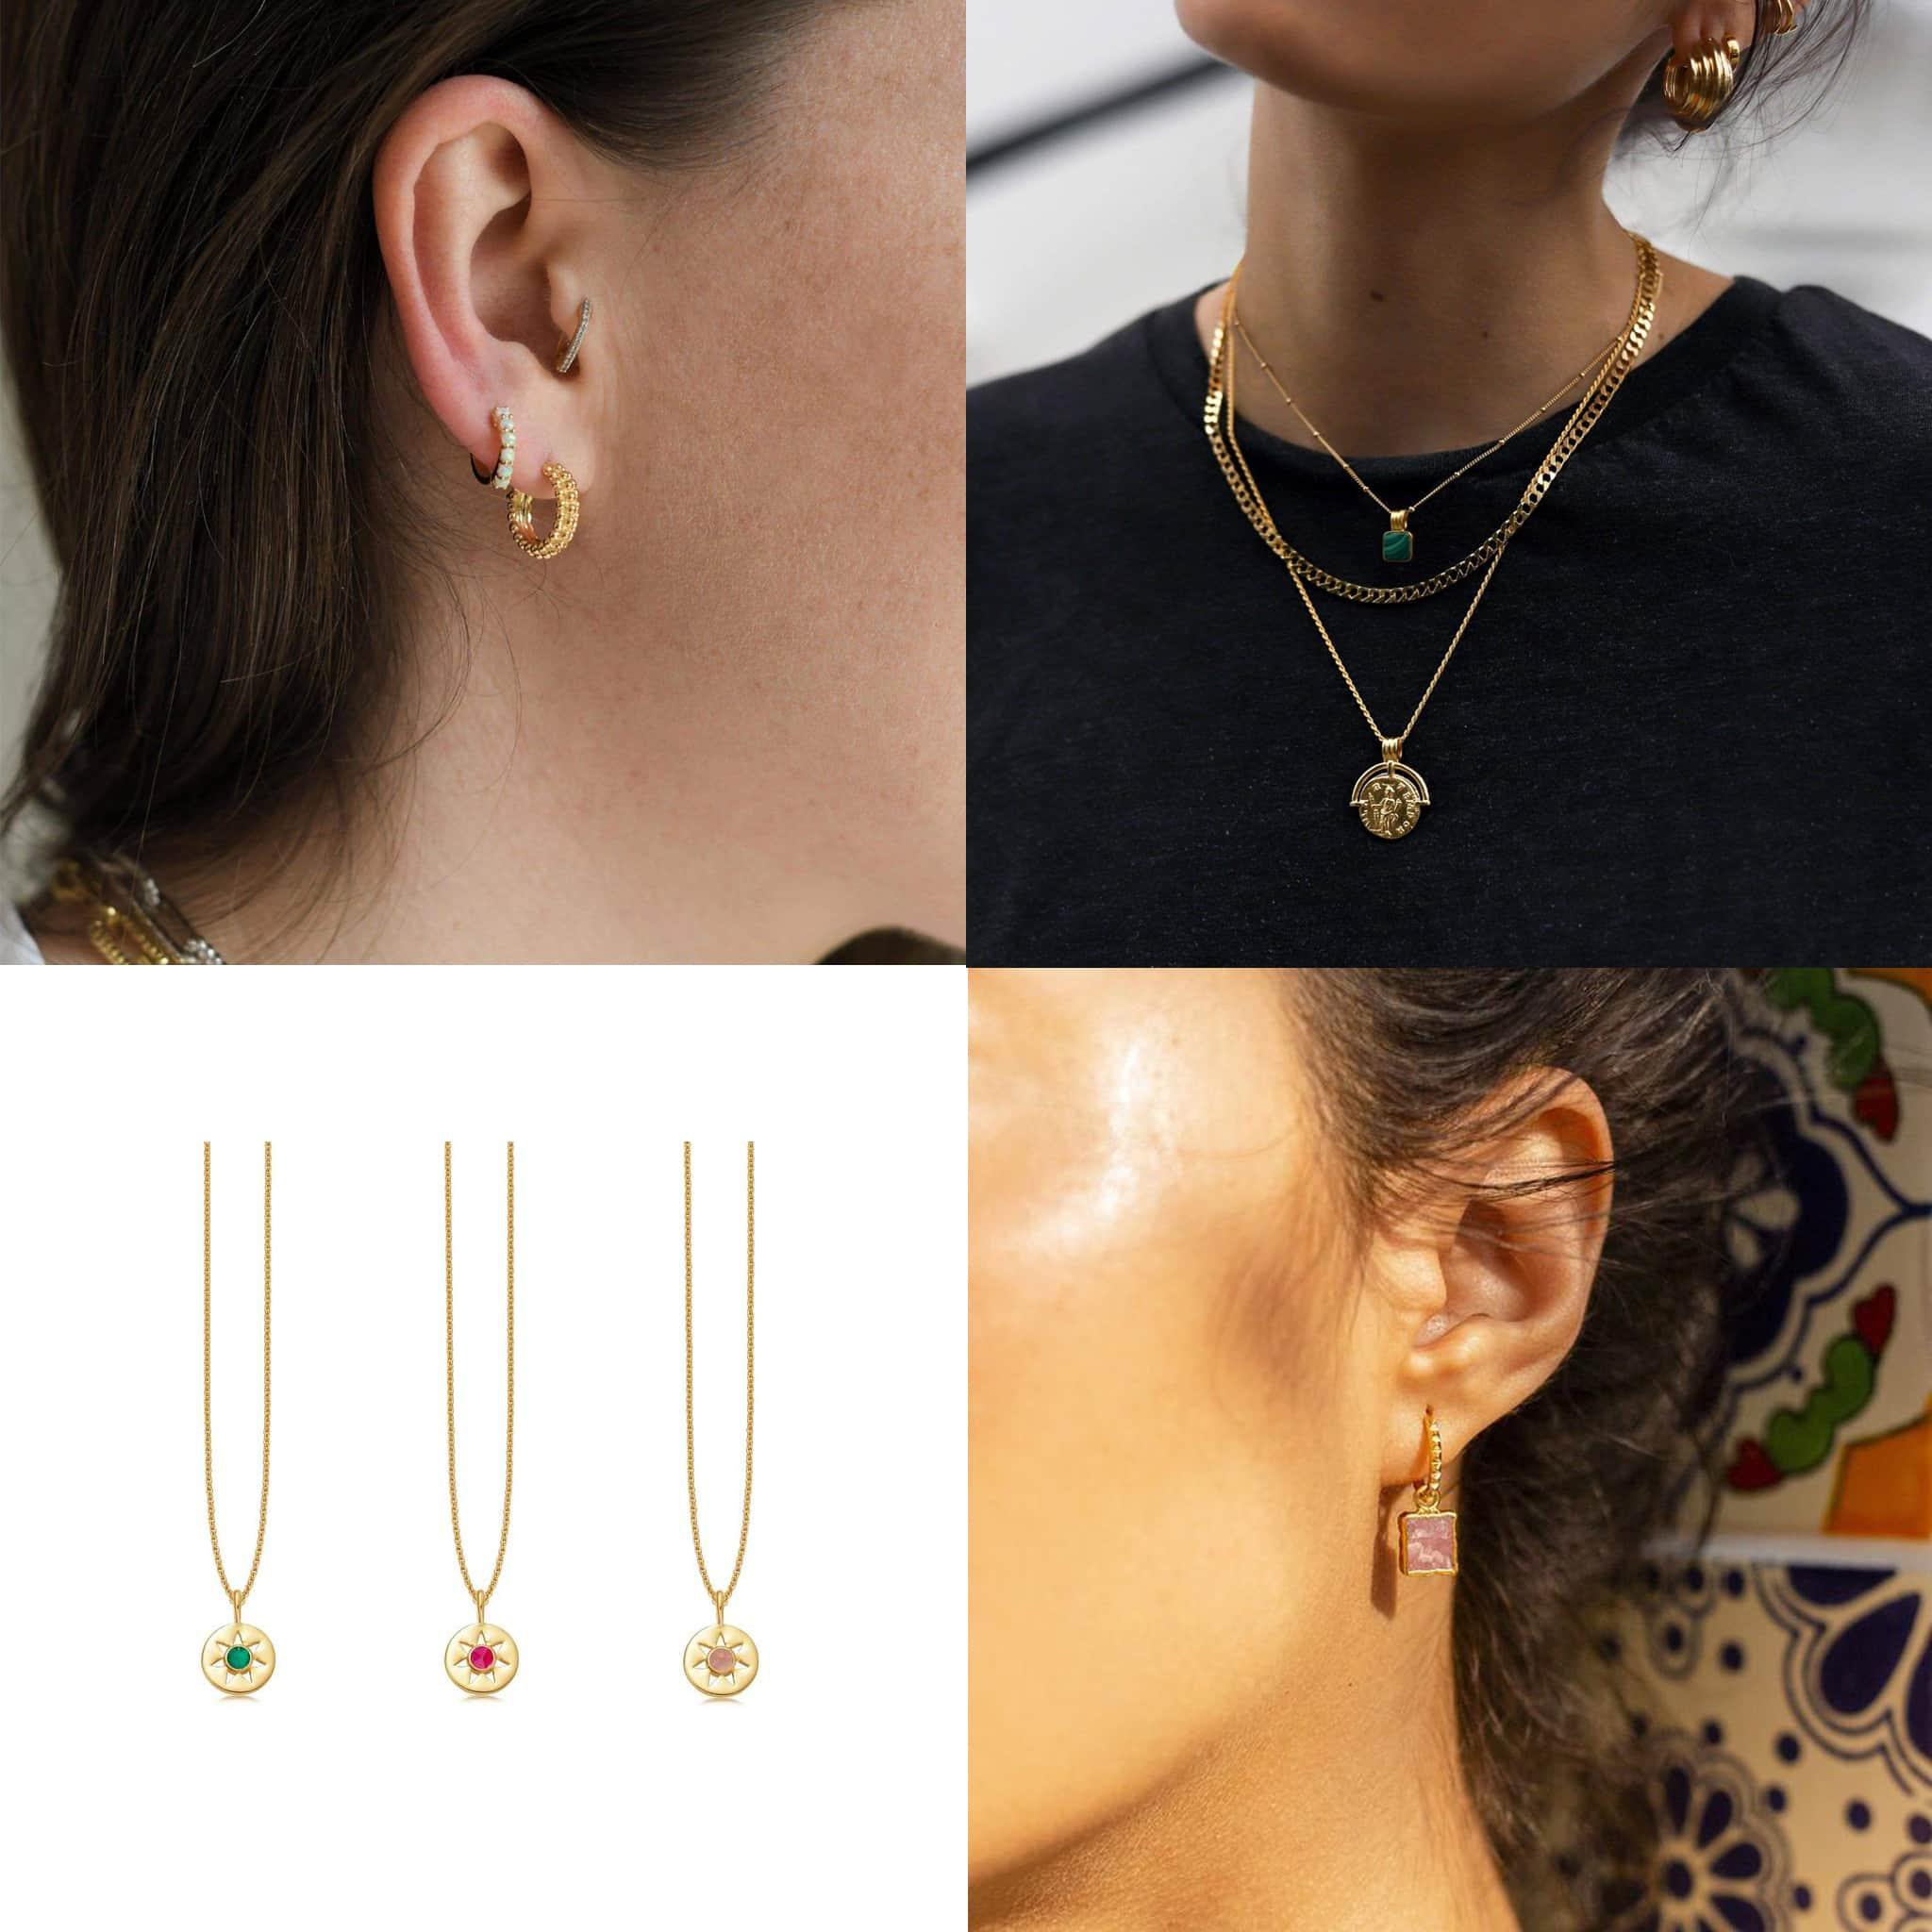 Missoma Mini Baya and Single Stone Huggies earring set, $175; Missoma Lucy Williams Roman Coin Malachite necklace set, $511; Missoma Birthstone Pendant necklace, $123; Missoma Mini Pyramid Charm hoop earrings, $110